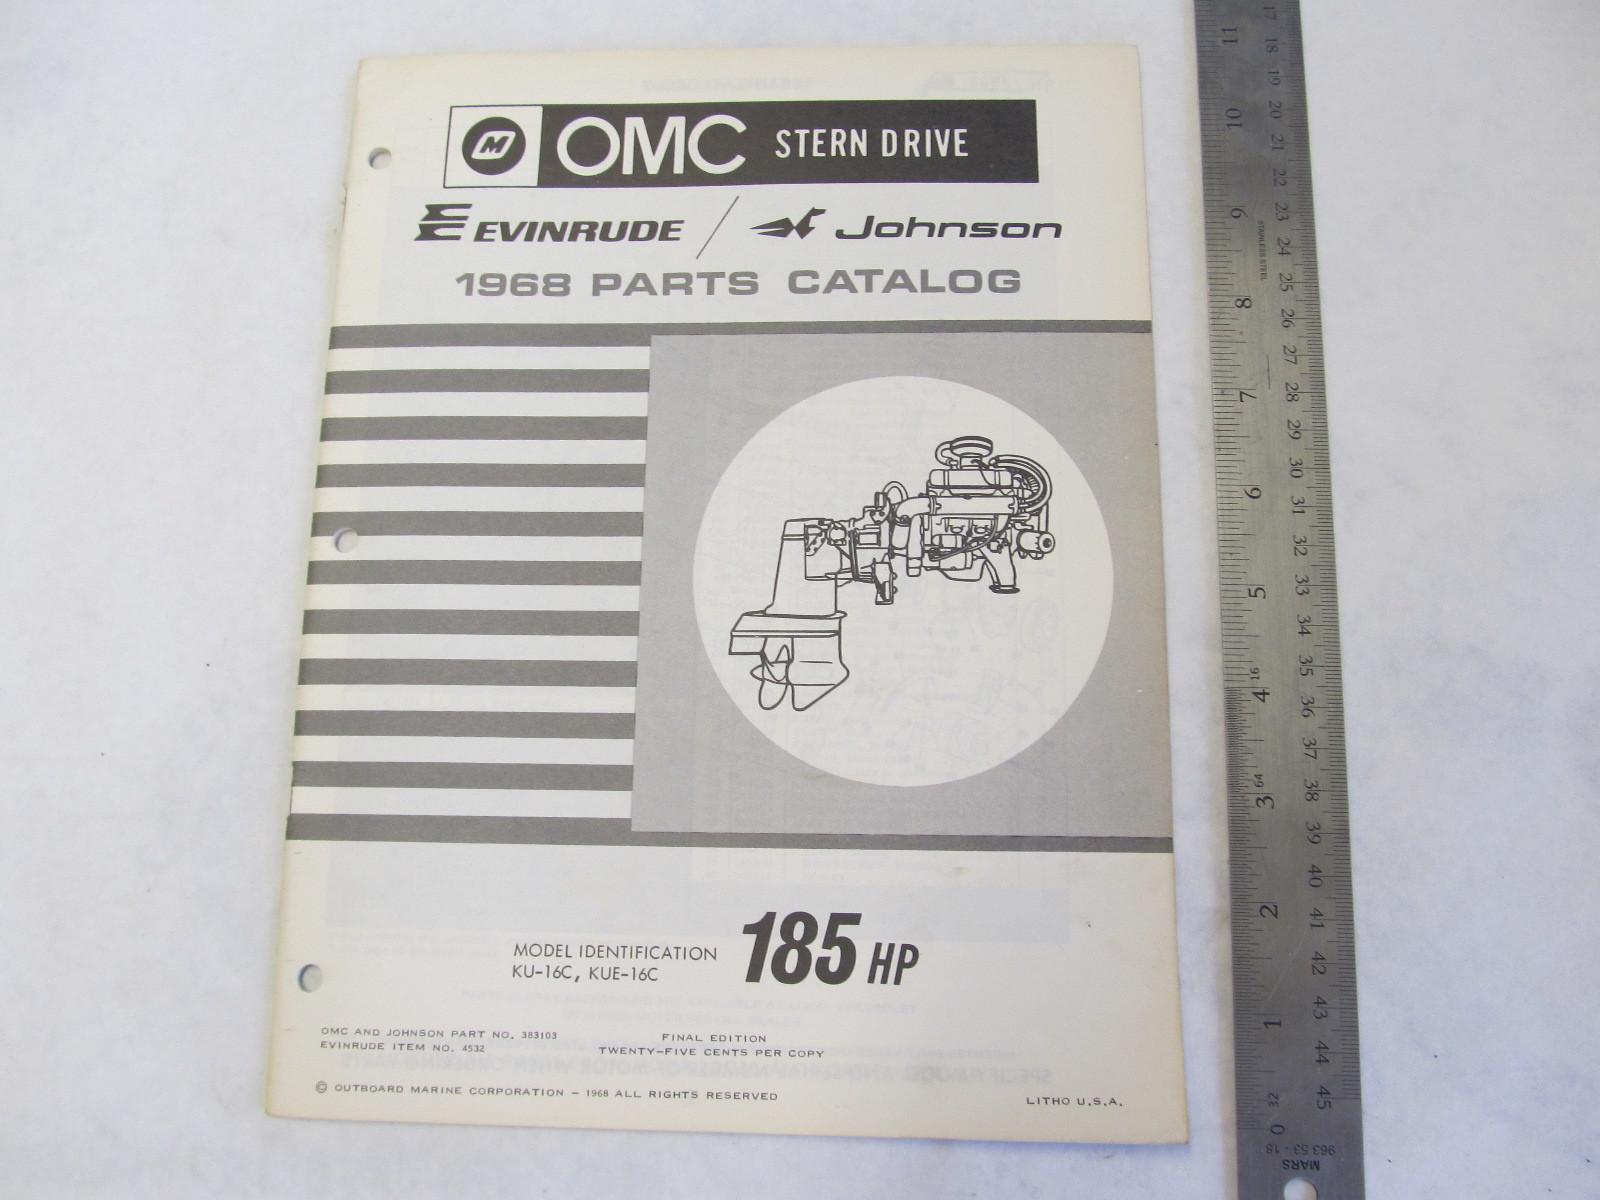 1968 OMC Stern Drive Parts Catalog 185 HP KU-16C KUE-16C